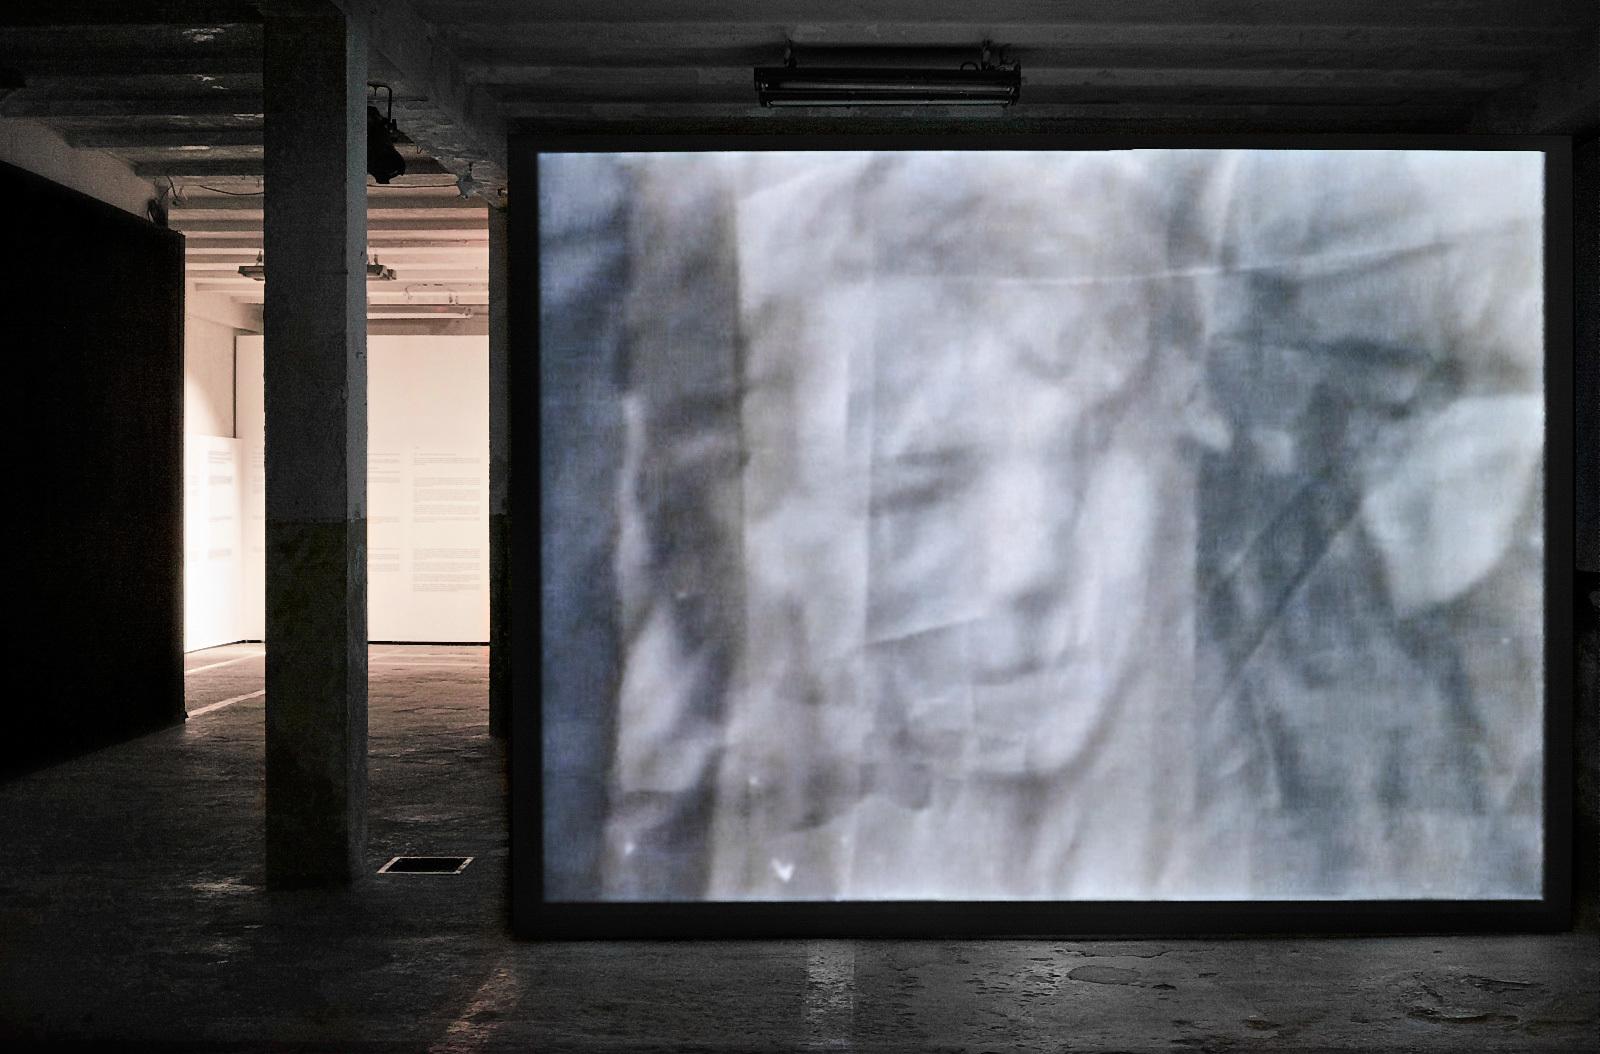 Hito Steyerl, Abstrakt, widok wystawy